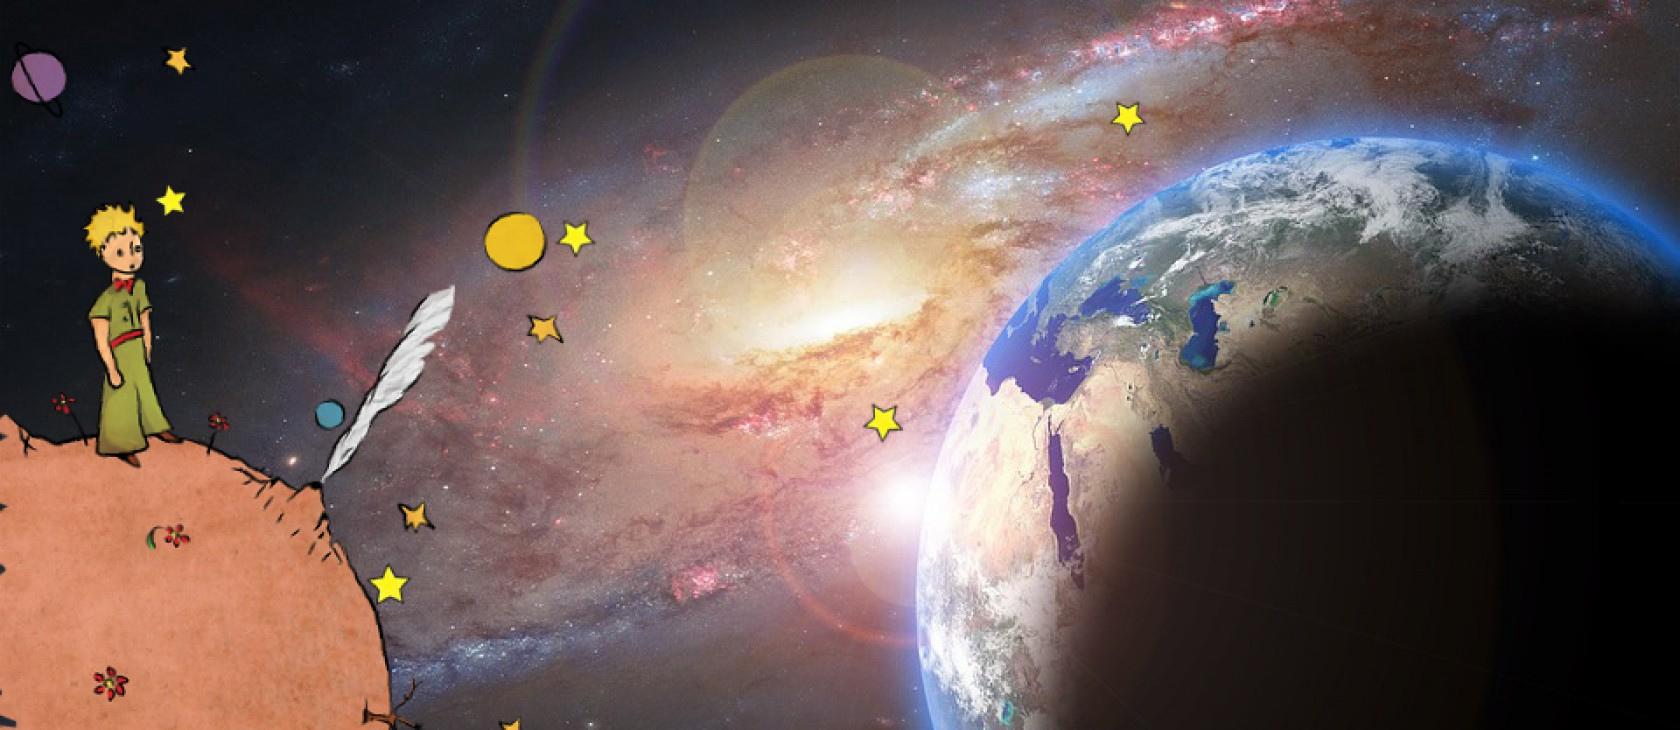 planet-1680x730.jpg.1f4b1bfd9d6179e1cec3665c22f0c2c4.jpg